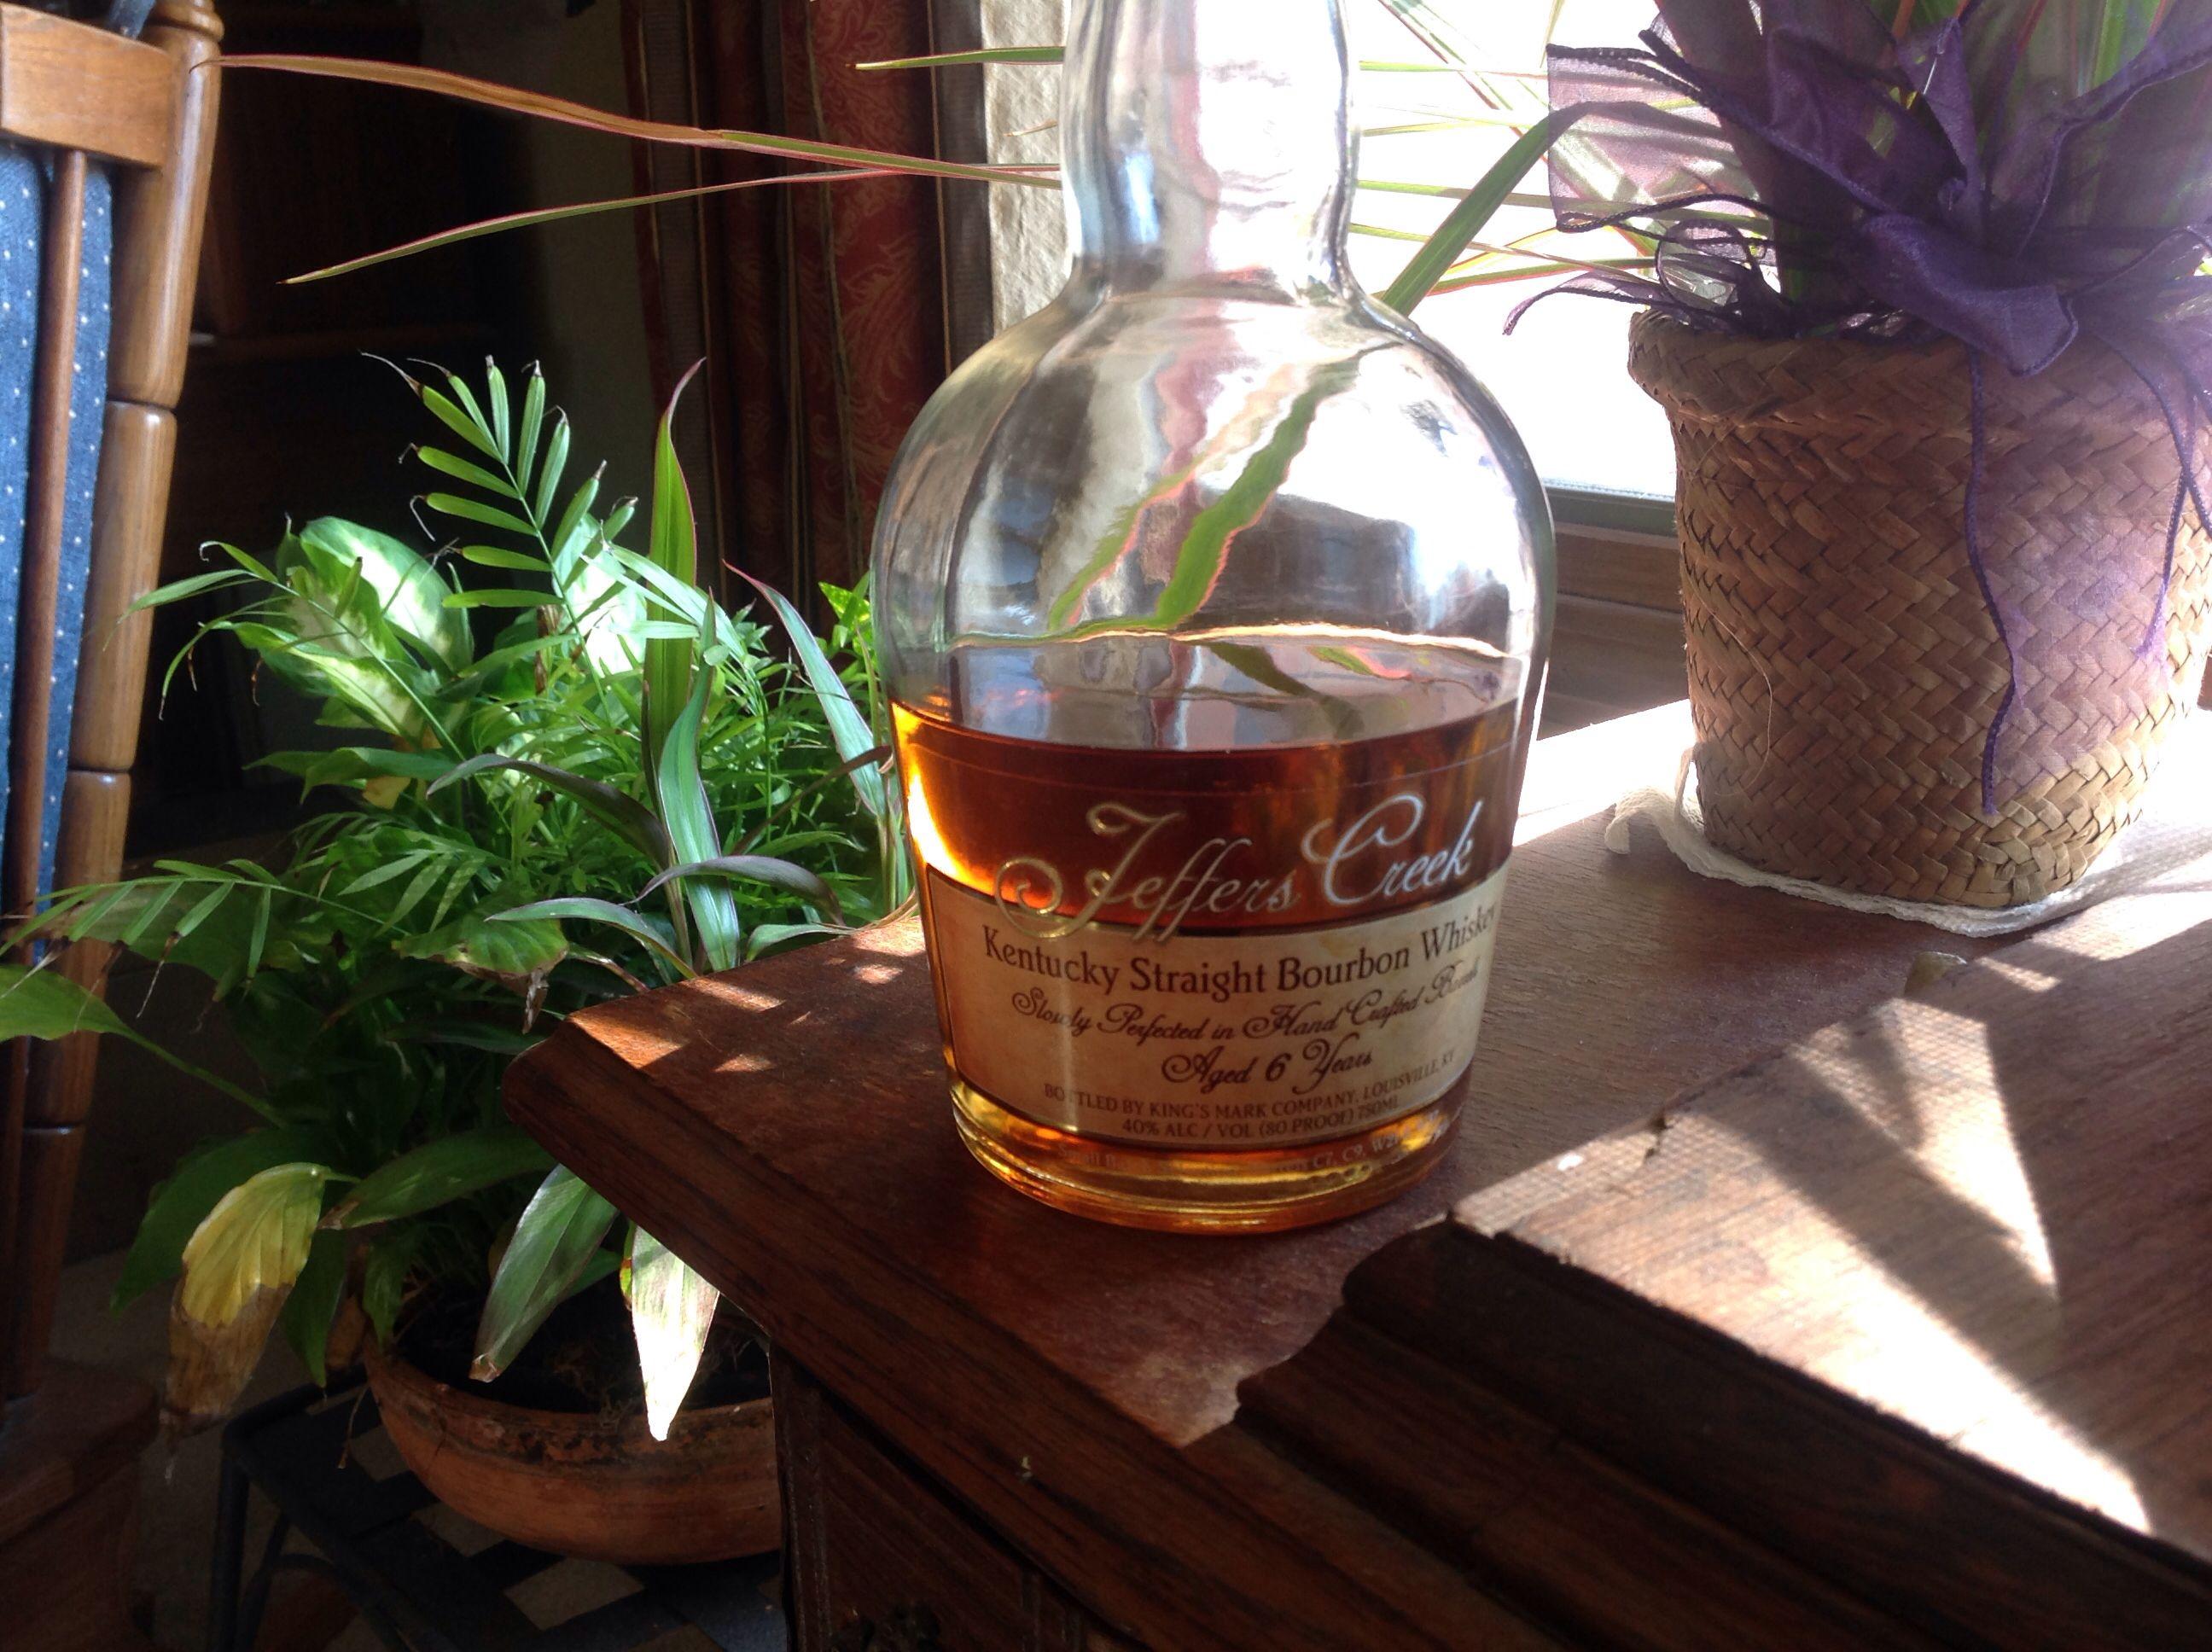 jeffers creek a respectable bourbon bourbons pinterest